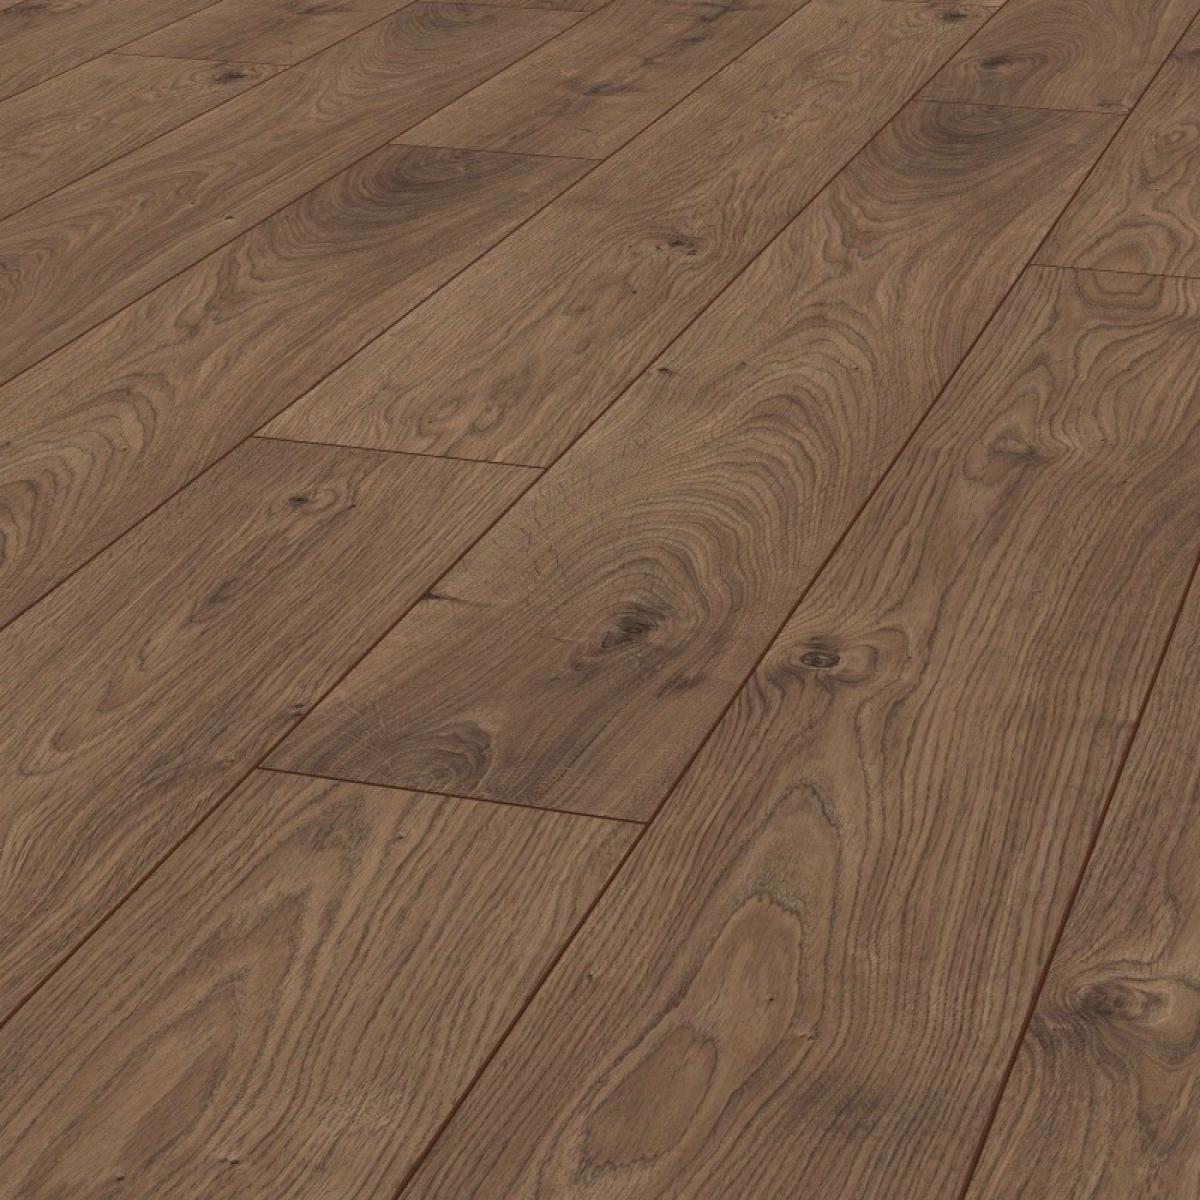 Kronotex Atlas Oak Coffee 12mm V Groove Ac5 Laminate Flooring Sample Piece